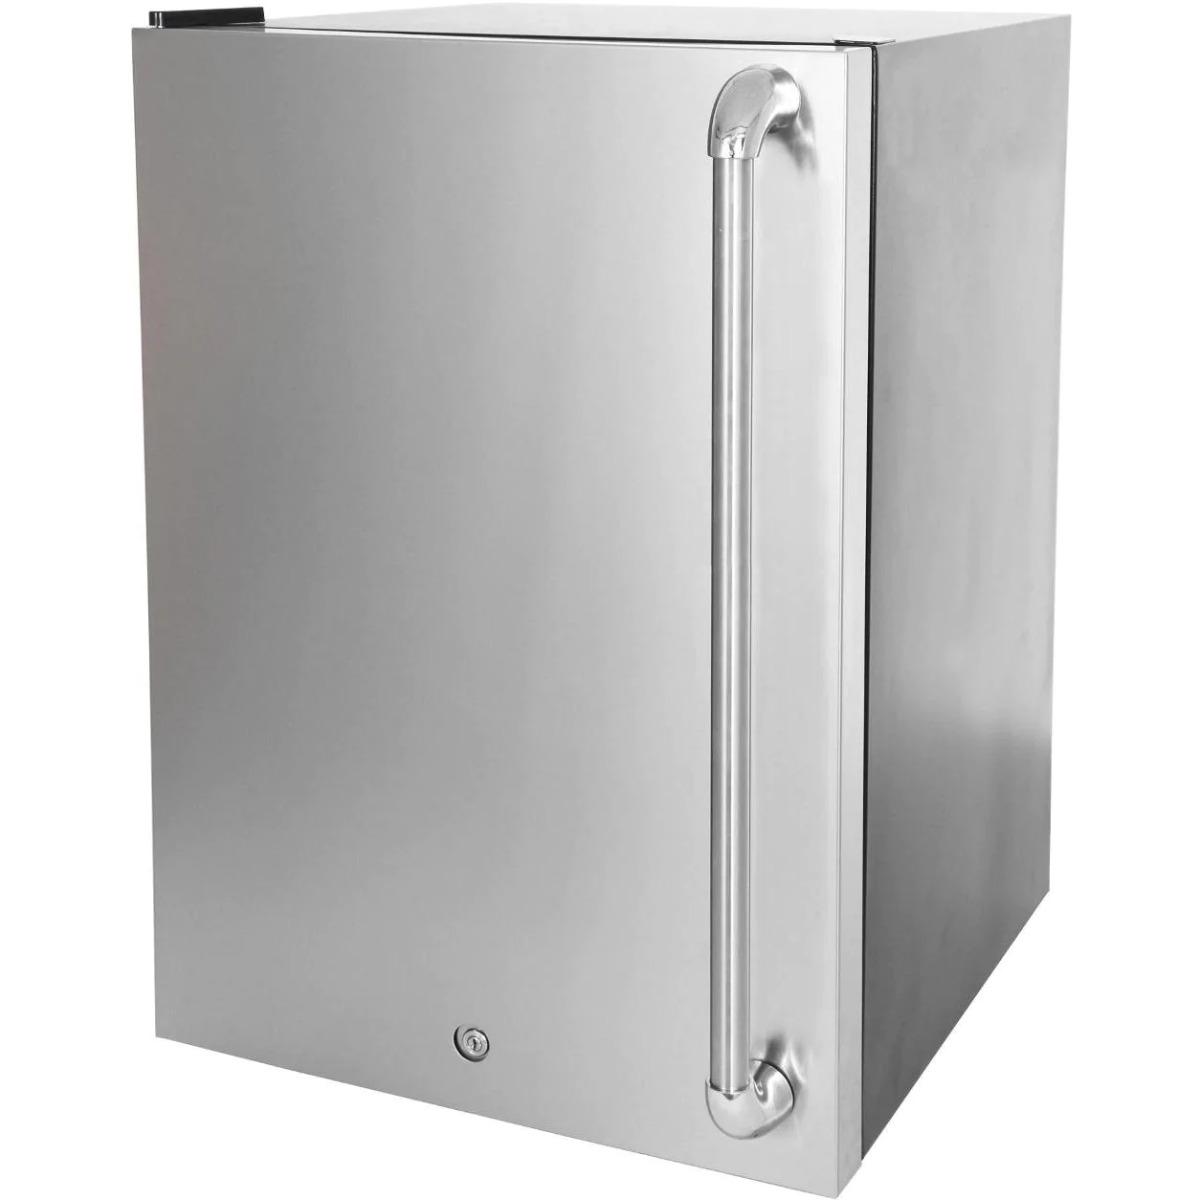 Blaze 20-Inch 4.5 Cu. Ft. Right Hinge Compact Refrigerator With Stainless Steel Door & Towel Bar Handle - BLZ-SSRF130+ BLZ-SSFP-4.5